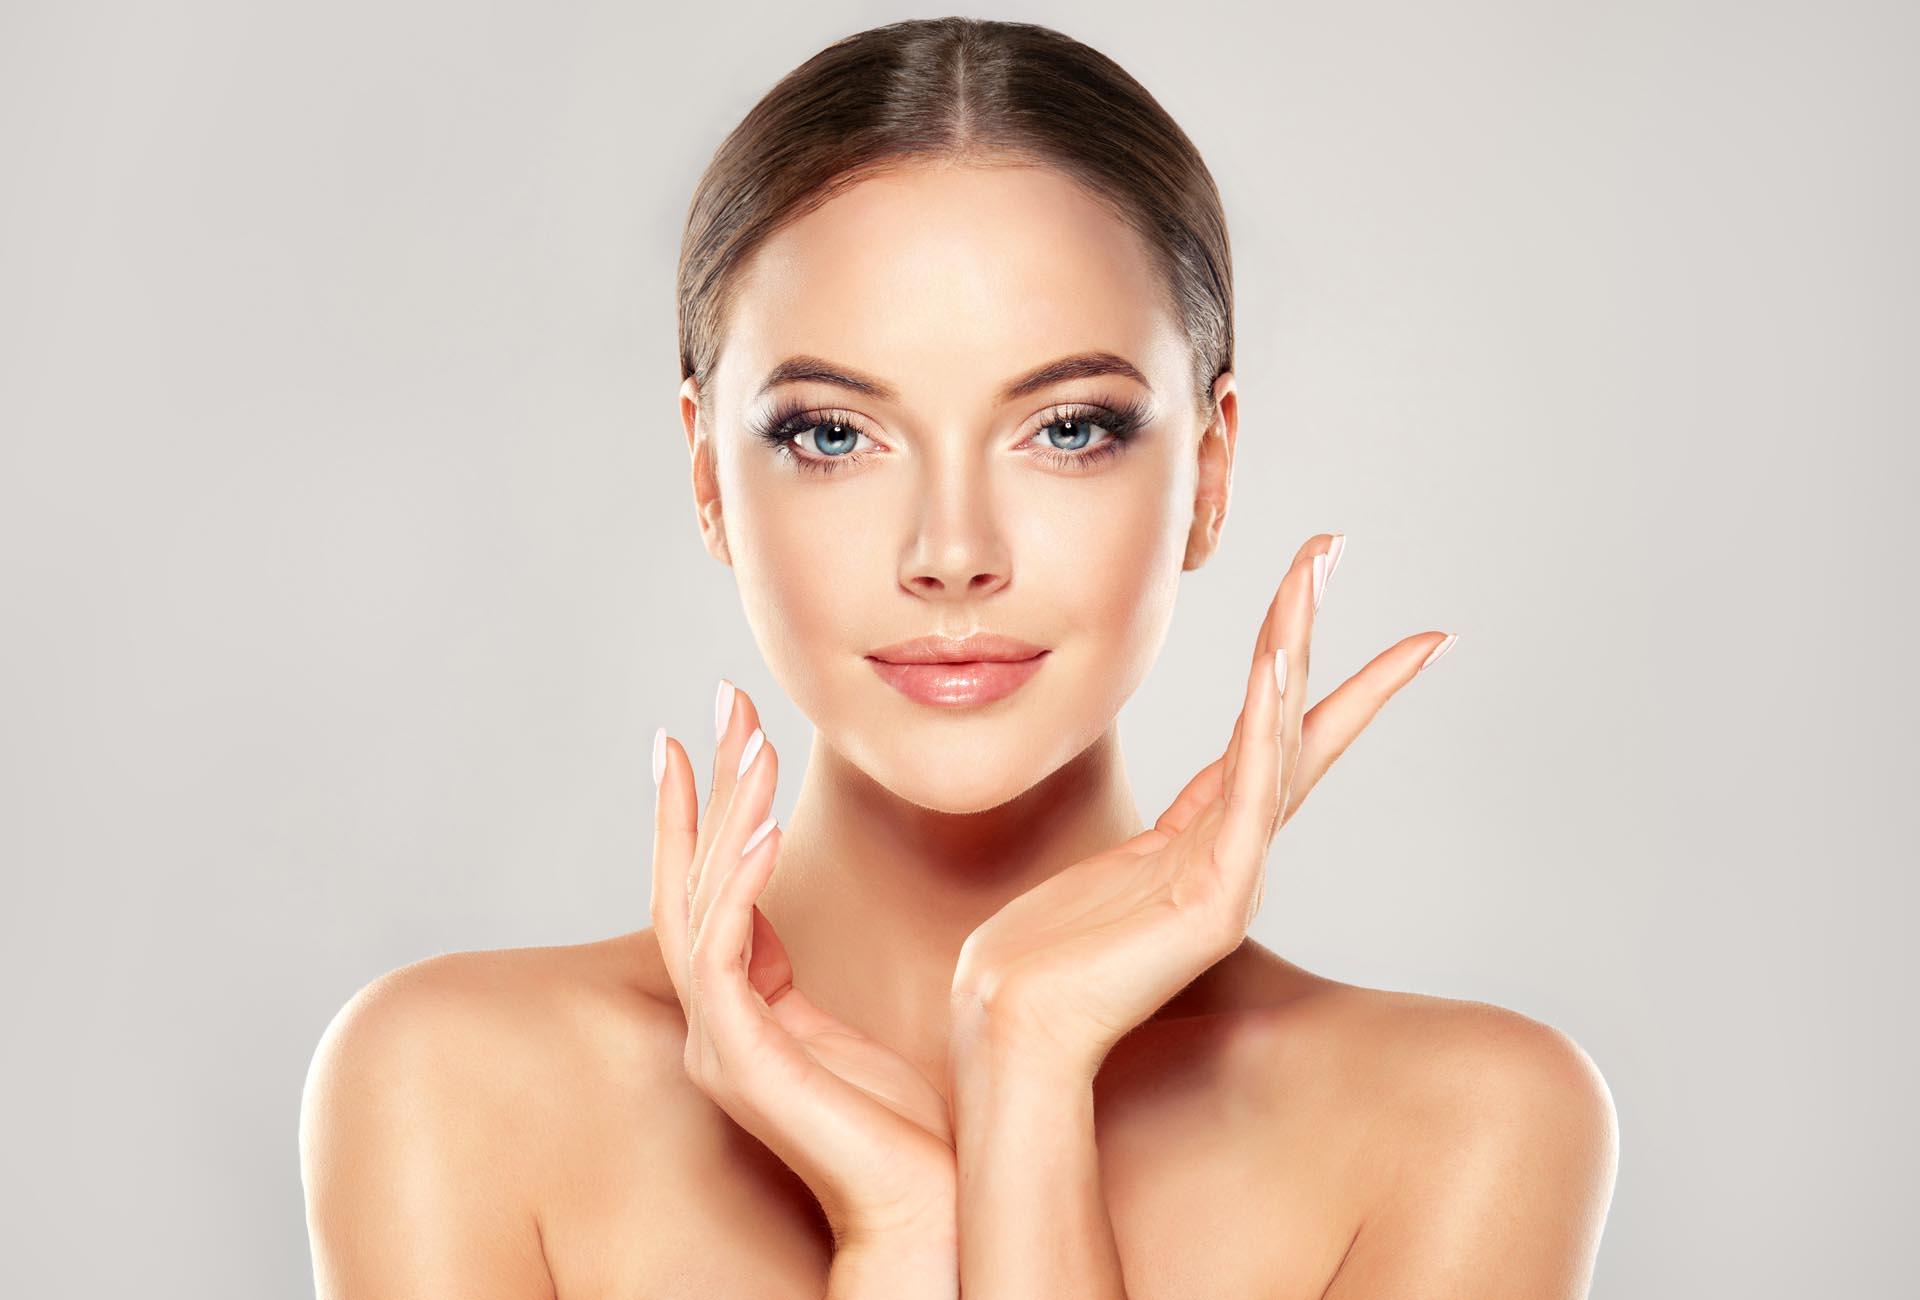 The Way To Lighten Freckles